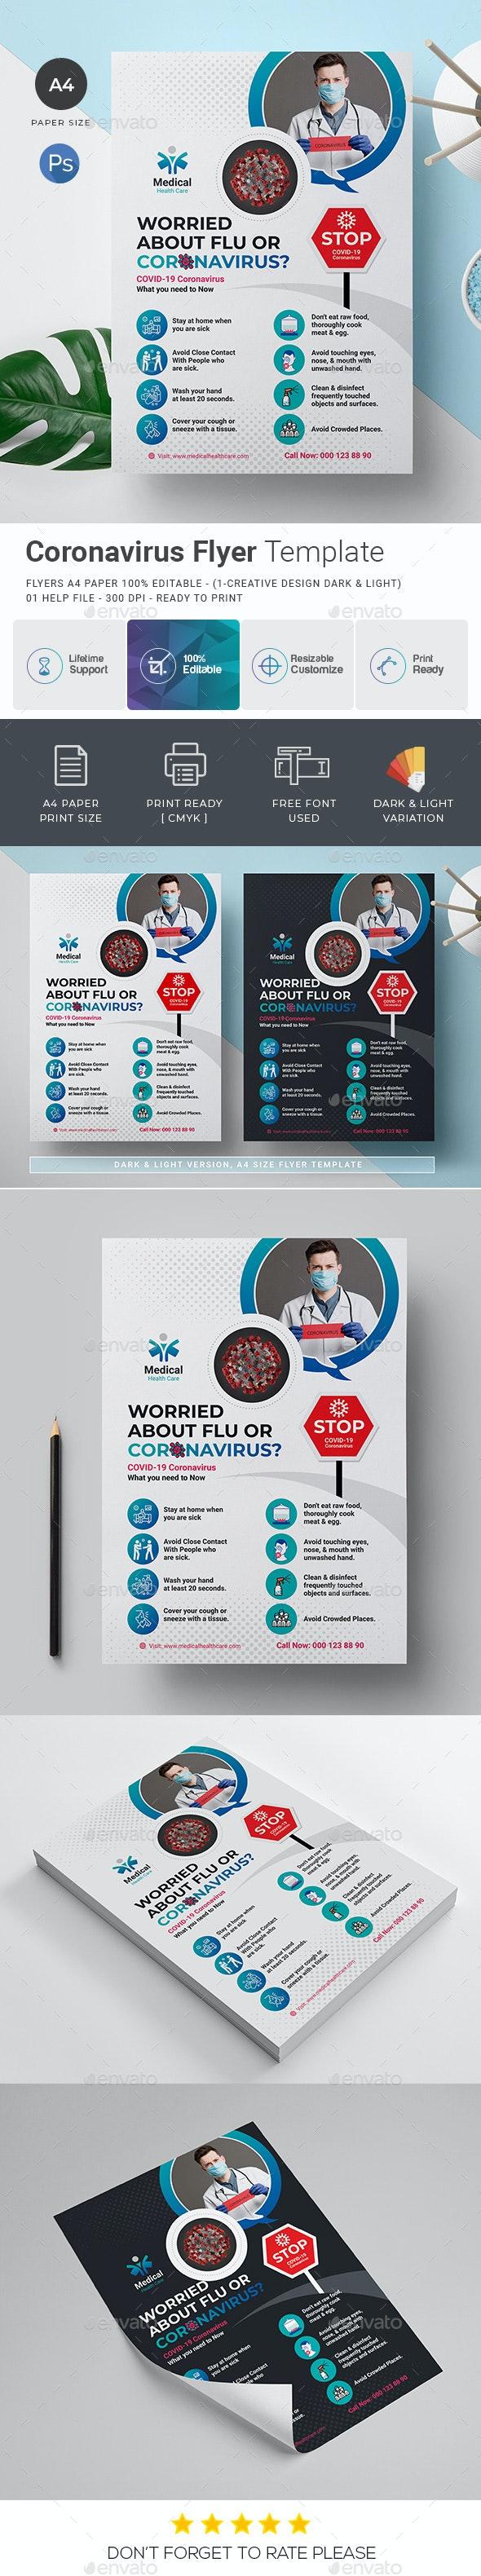 Coronavirus Campaign Flyer Template - Corporate Flyers